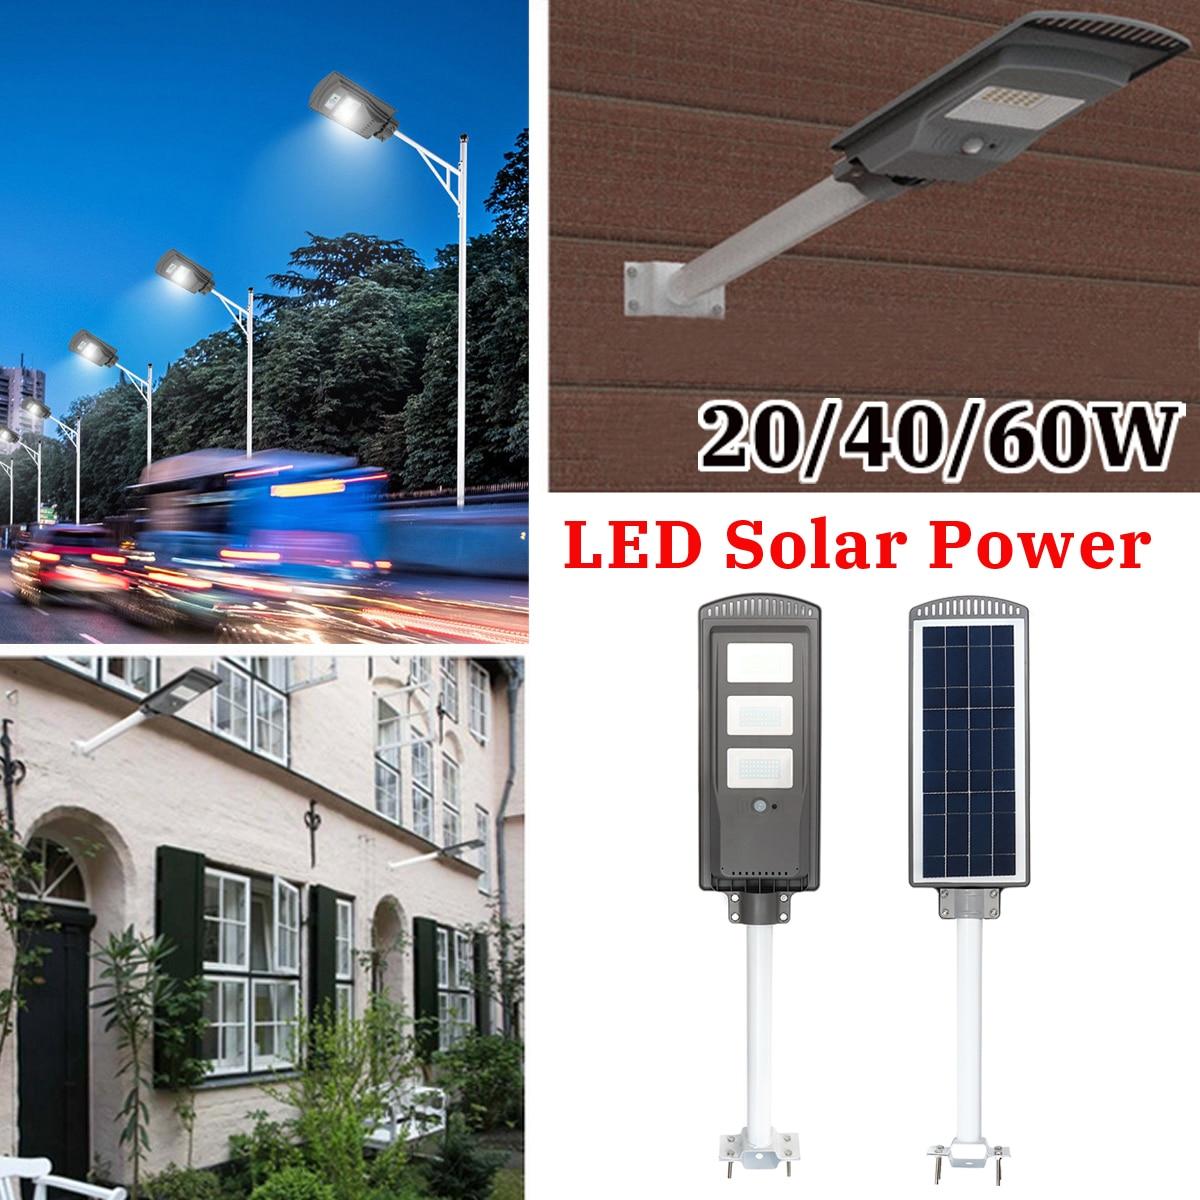 20//40W LED Solar Light Outdoor Wall Street Light Sensor Lamp Remote Control UK